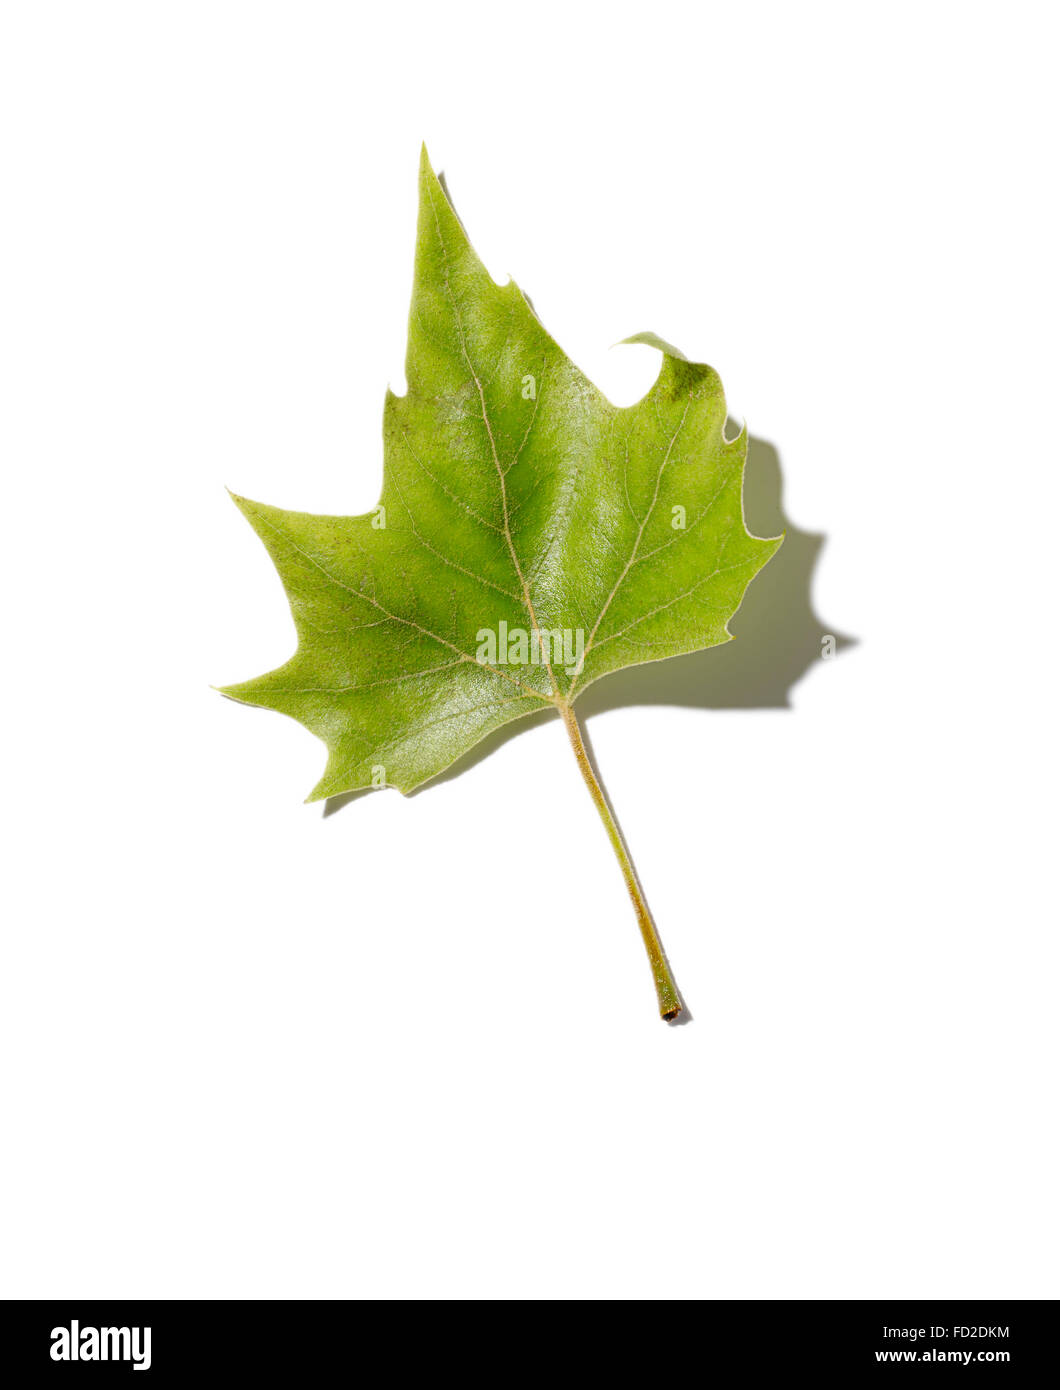 A fallen deciduous green tree leaf. Stock Photo